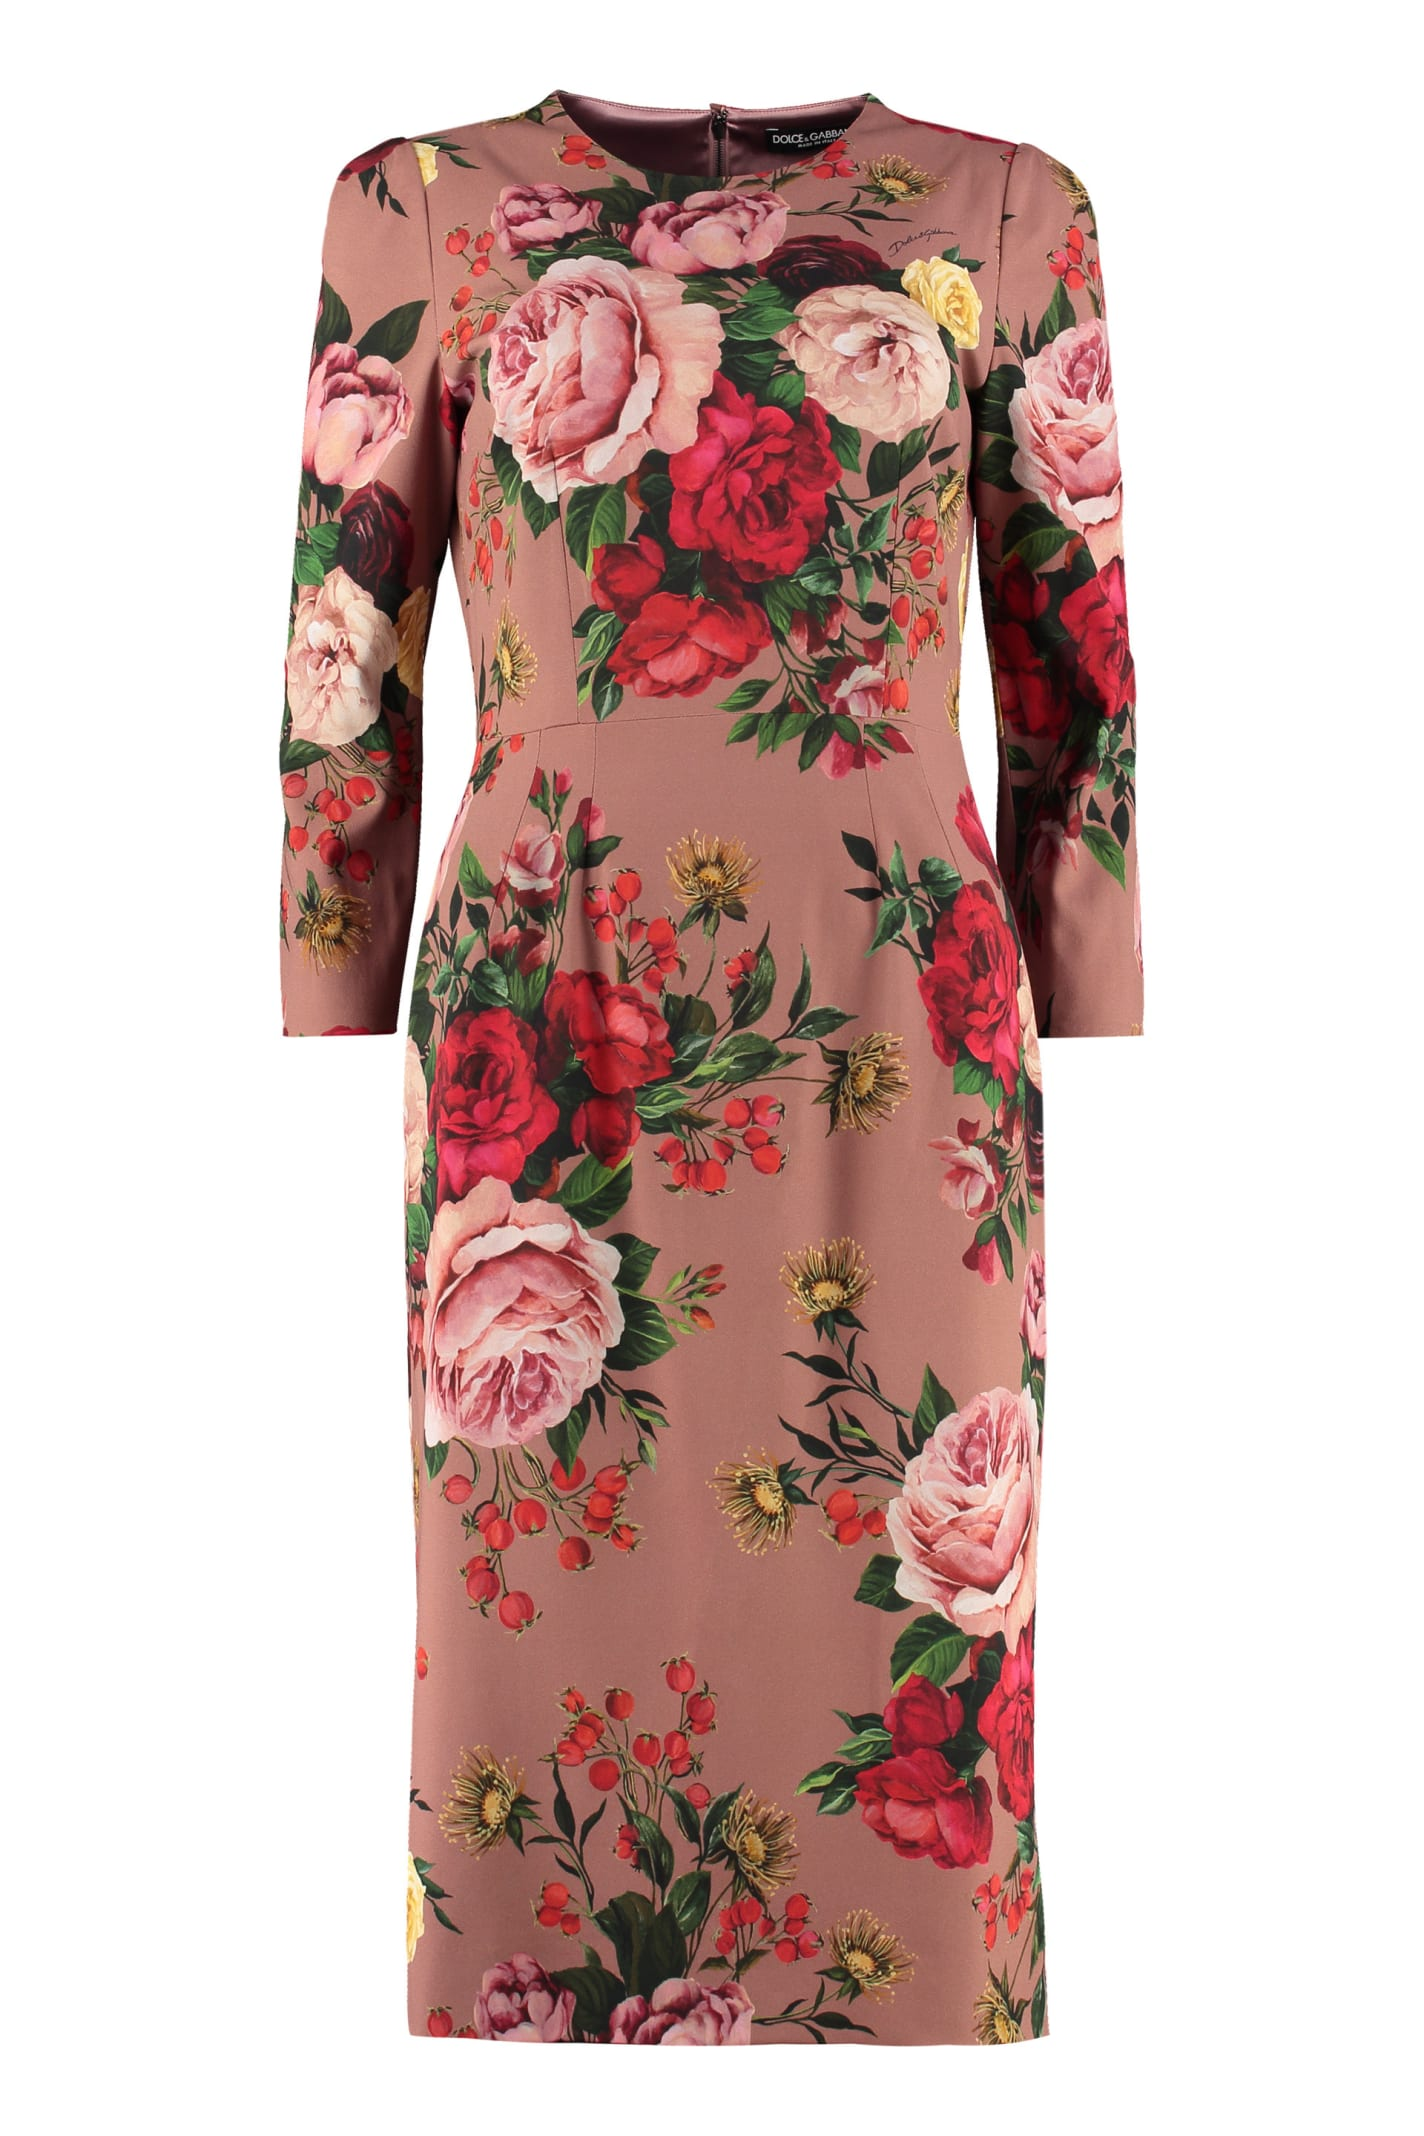 Dolce & Gabbana Dresses FLORAL SHEATH DRESS